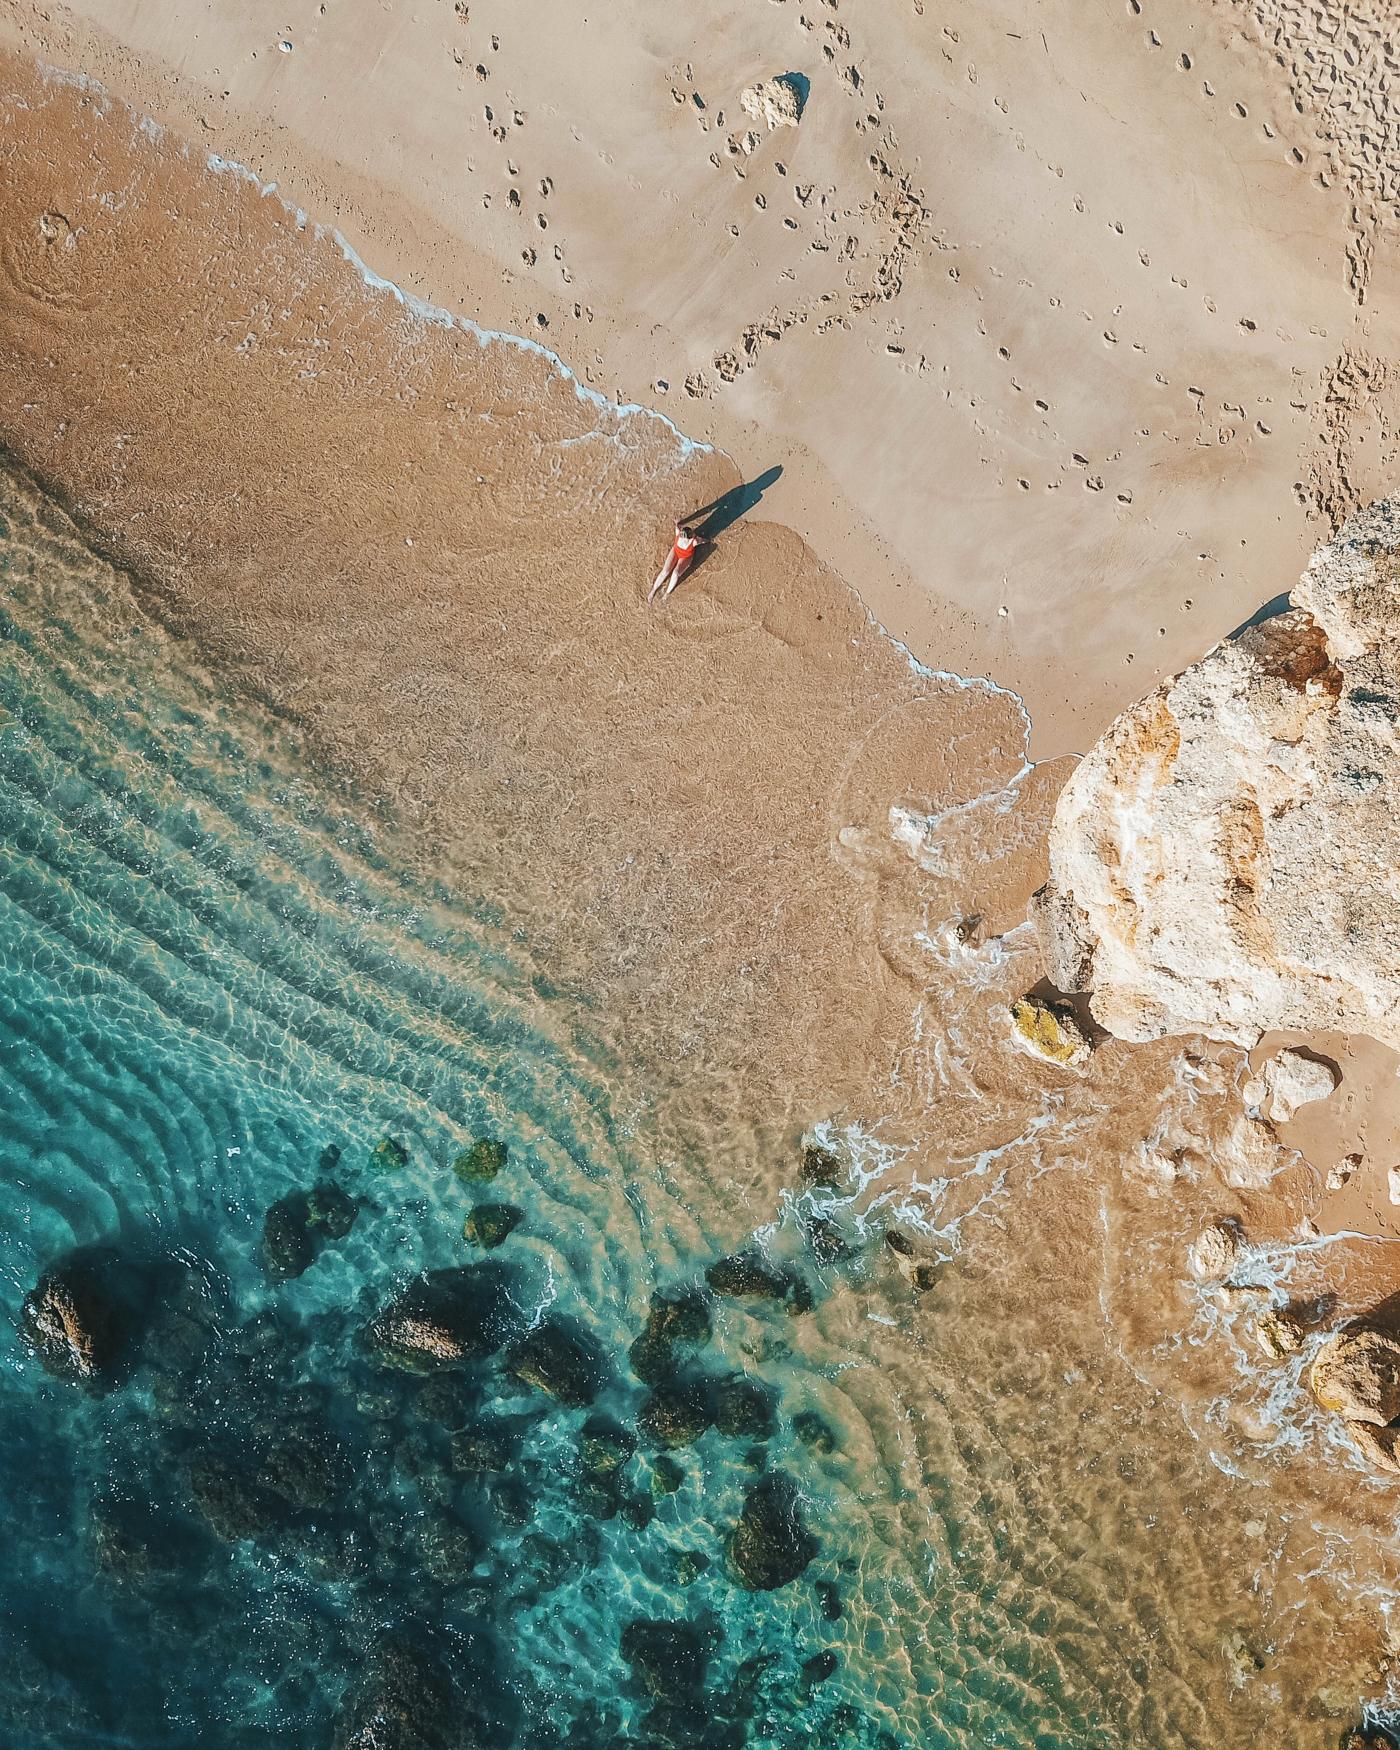 Overhead drone footage of beach